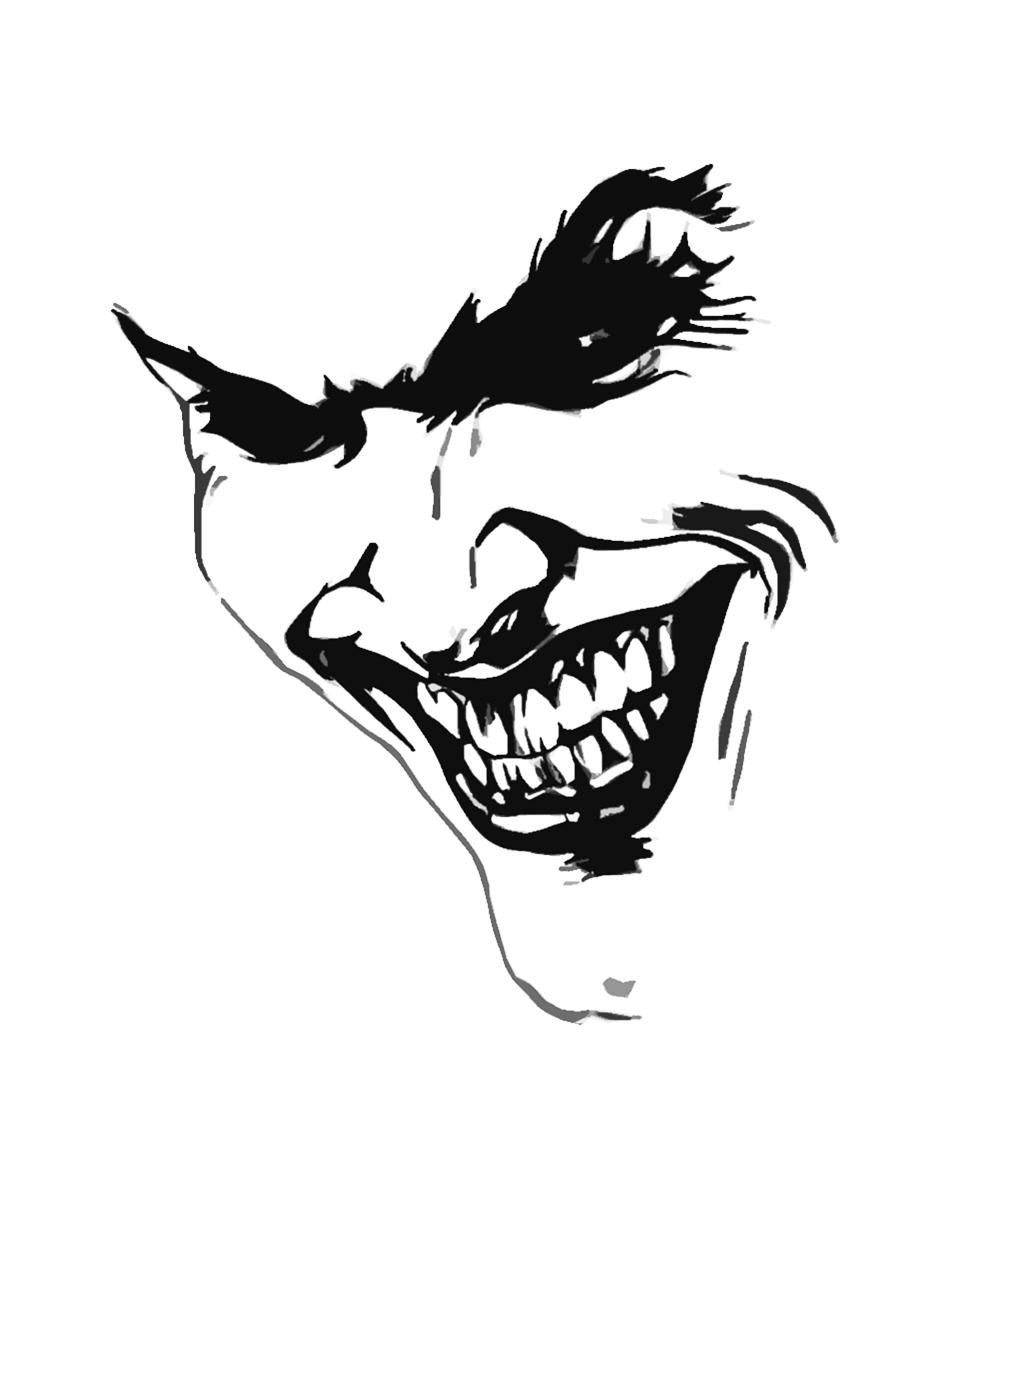 Bike stickers design joker -  Nepst3r S Deviantart Gallery Tribal Joker Airbrush Tattoo Design